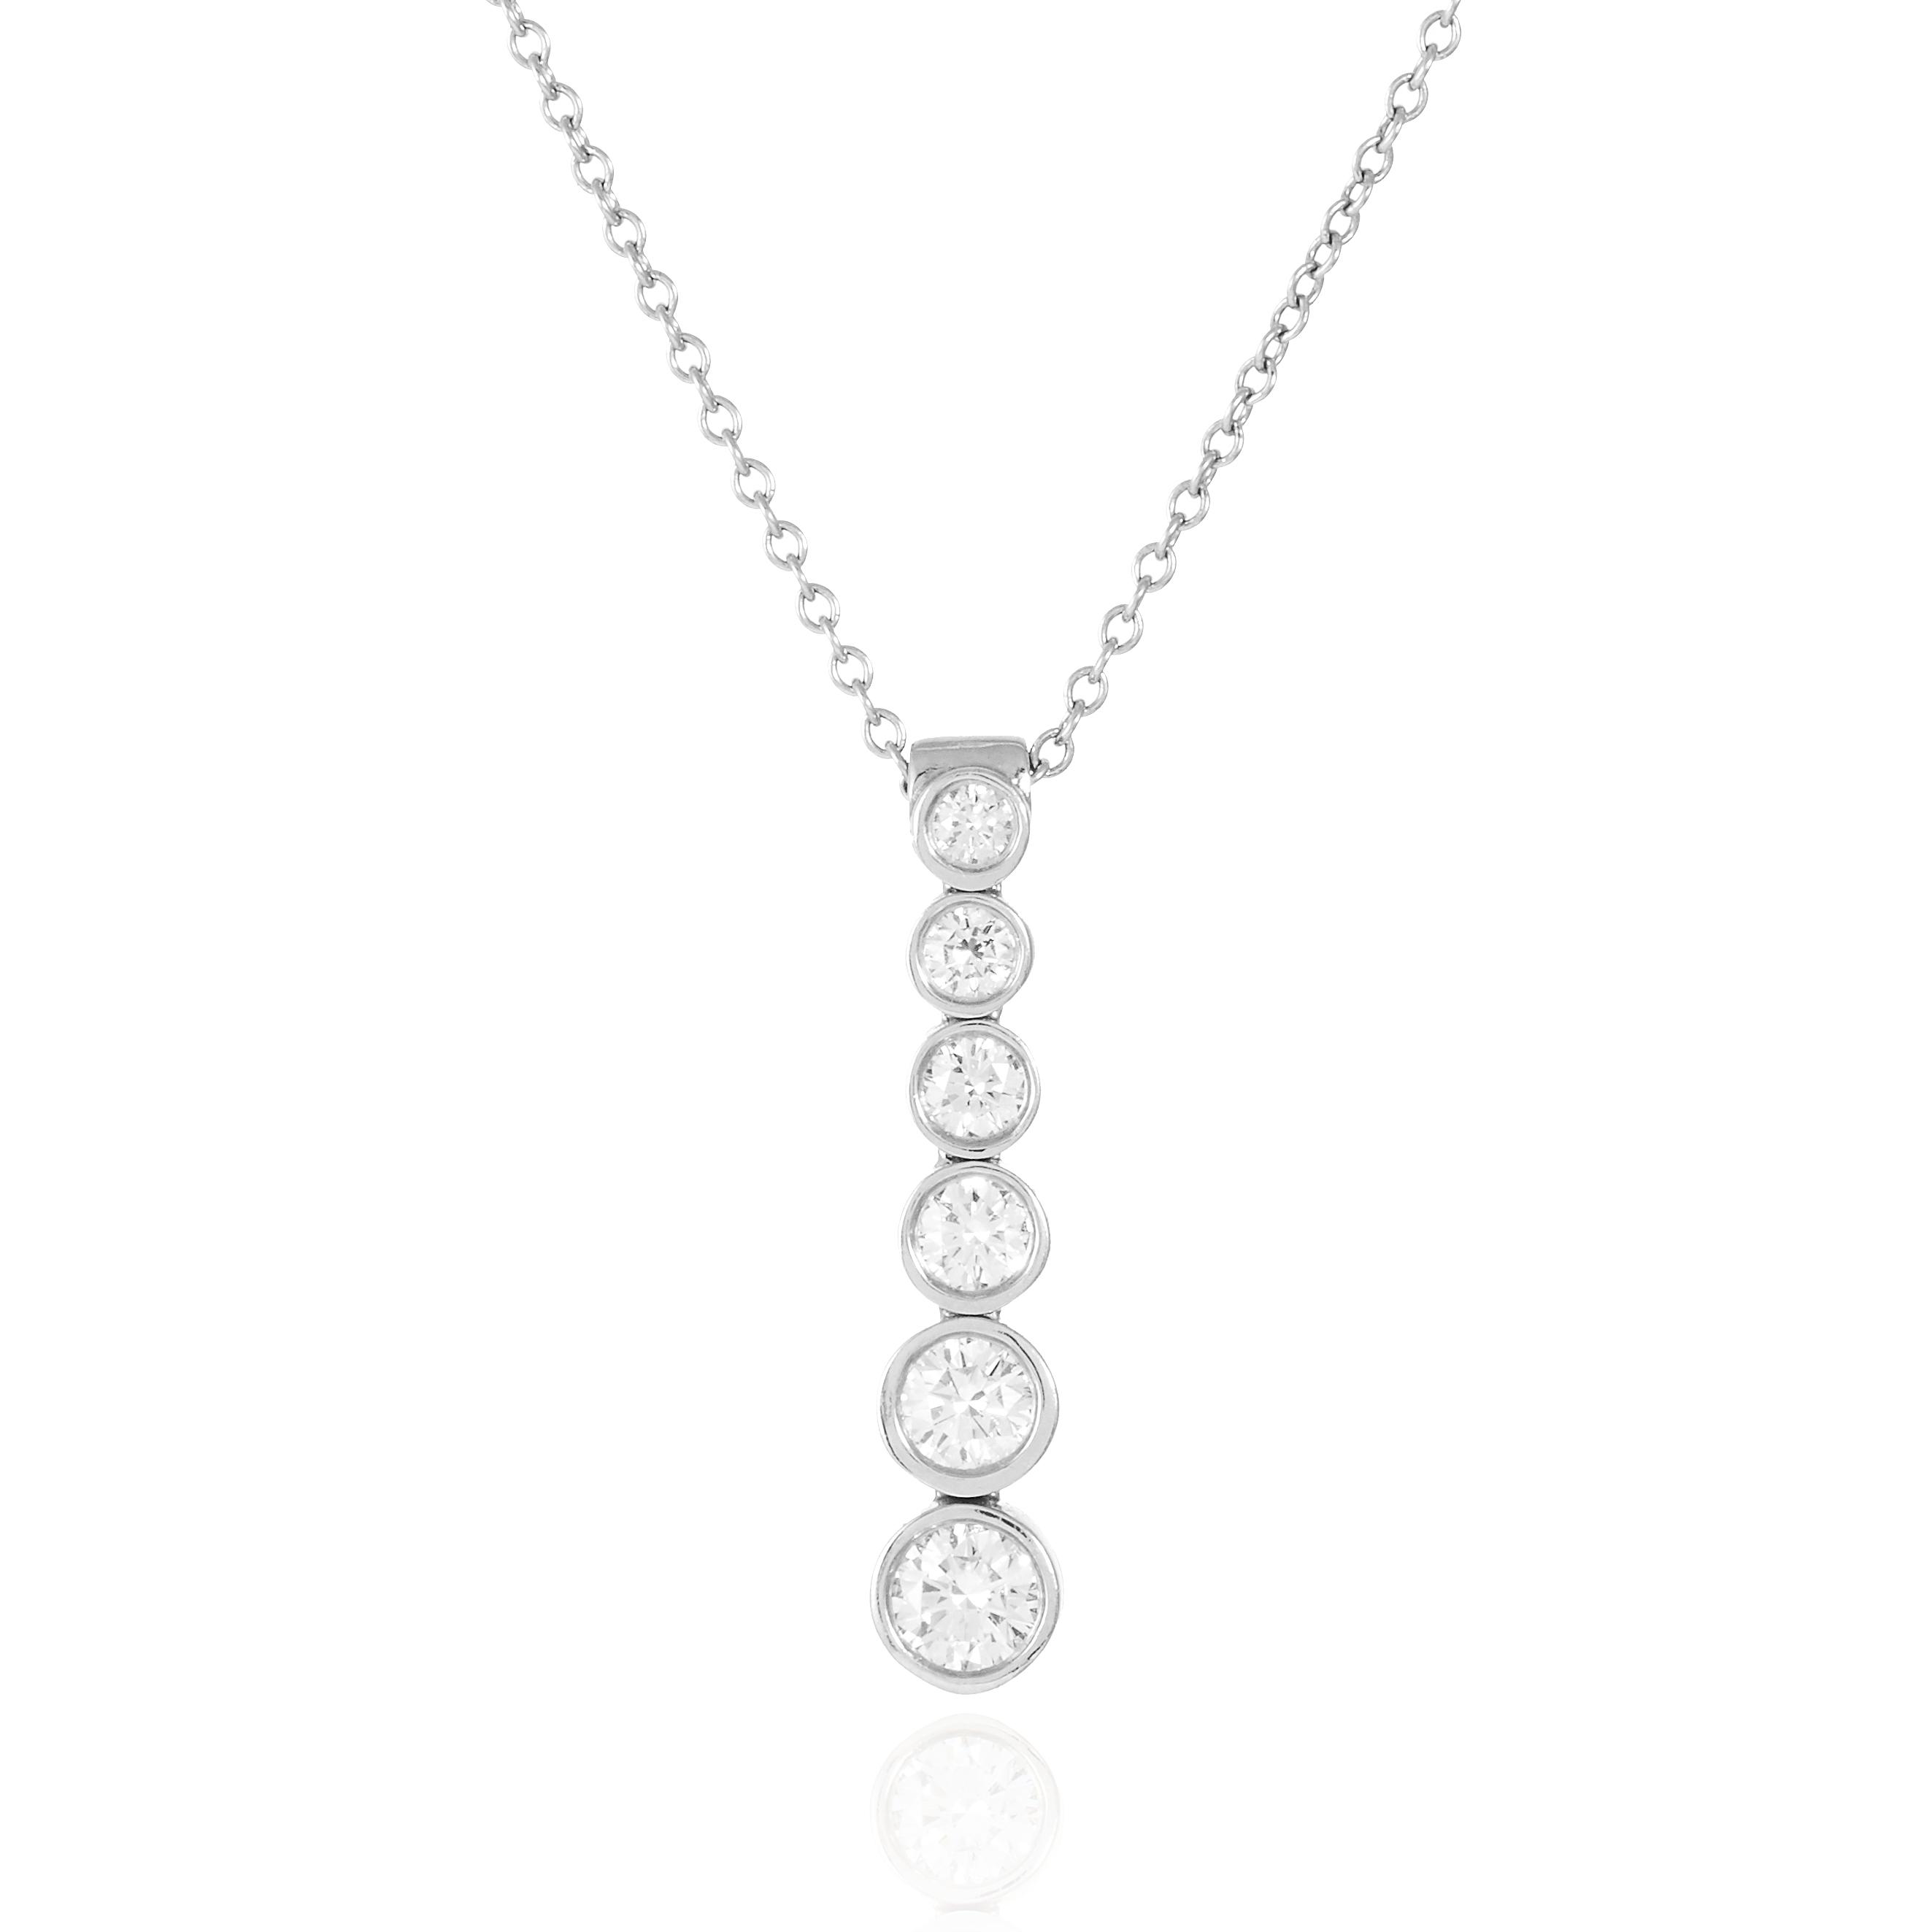 A DIAMOND PENDANT, TIFFANY AND CO, CIRCA 2003 in platinum, suspending six round cut diamonds